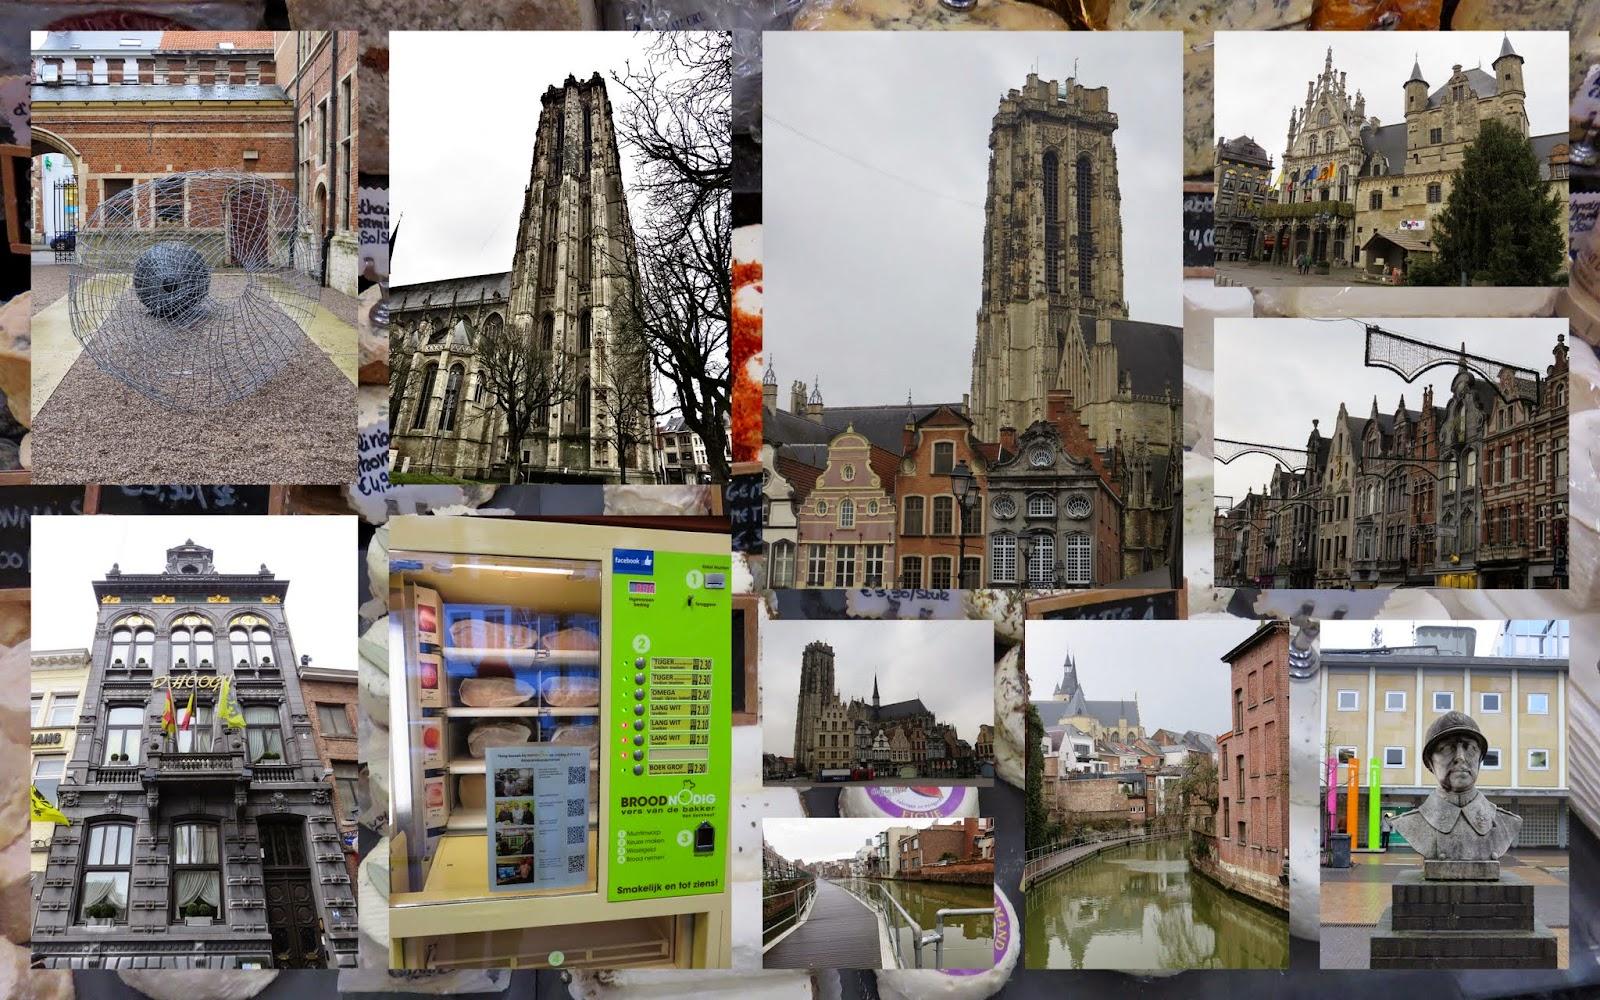 Mechelin, Belgium